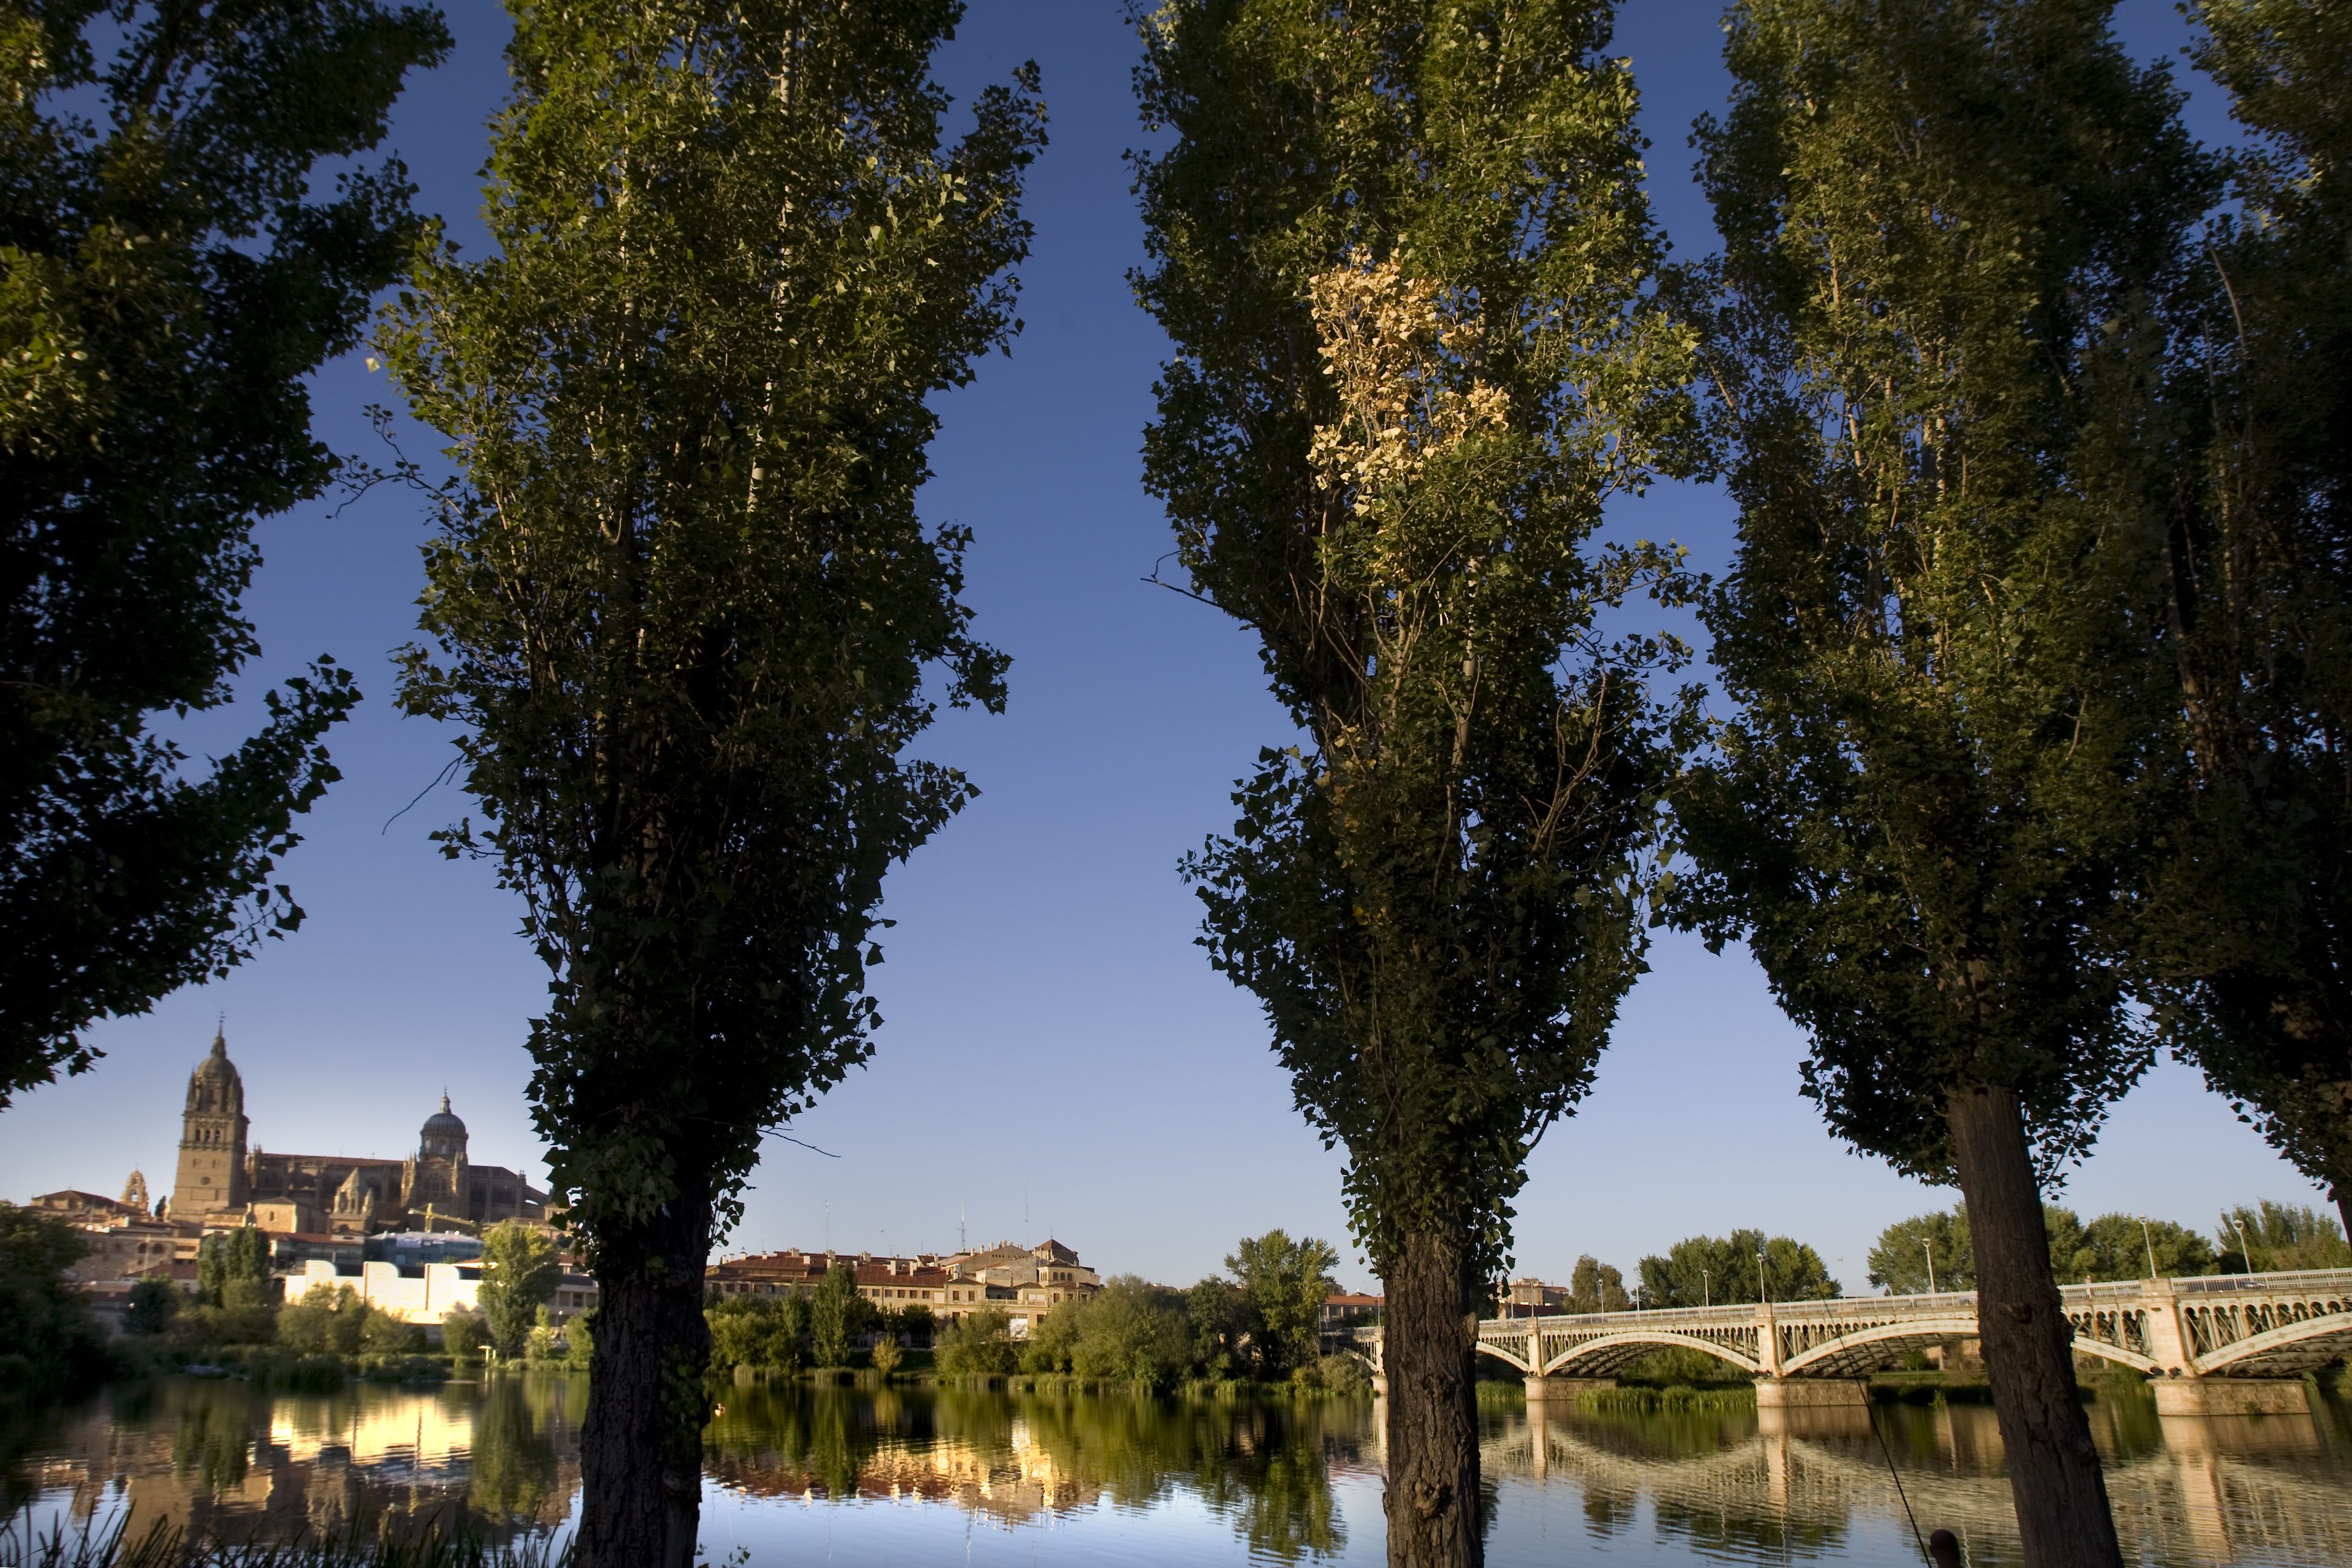 FOTO_Salamanca_Qcalidad_18122012